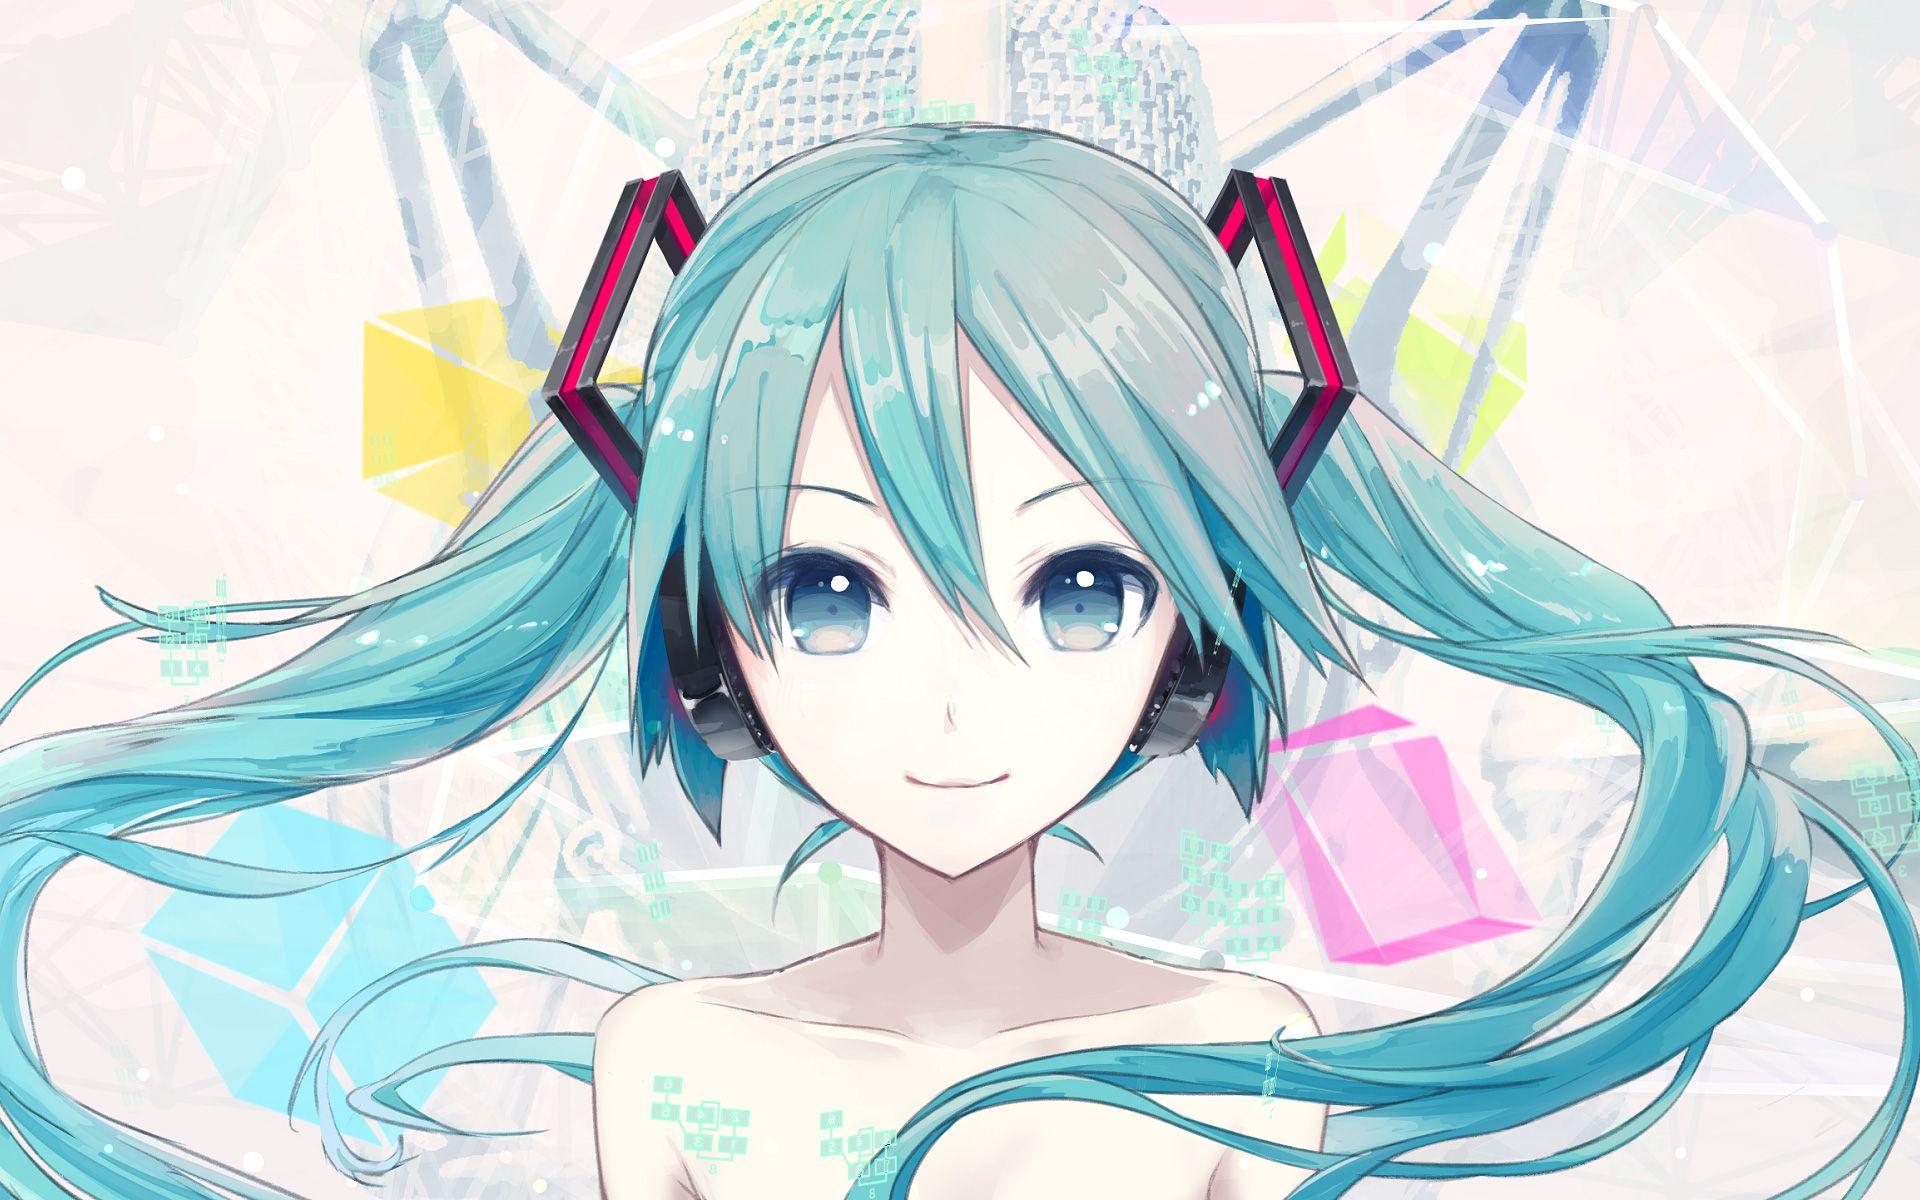 Yandere 350218 Hatsune Miku Headphones Ixima Vocaloid Wallpaper 1920x1200